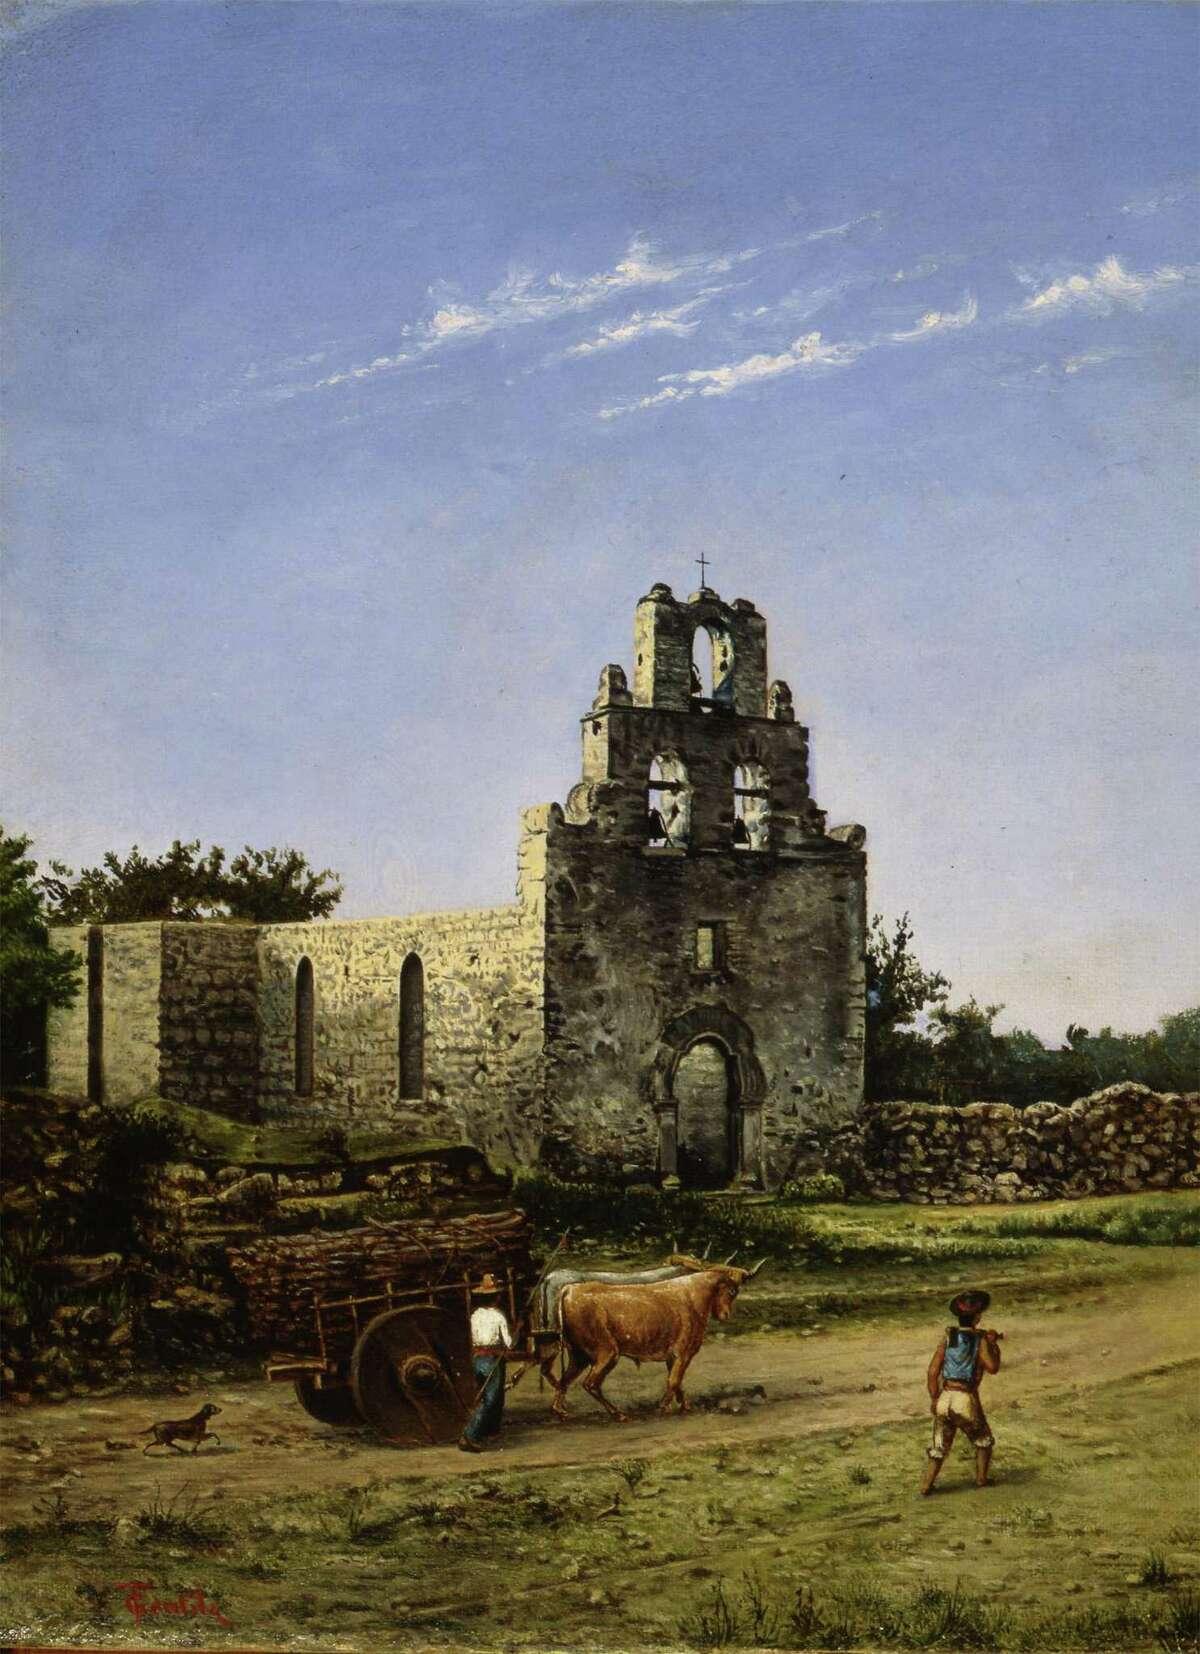 Mission San Francisco de la Espada is one of at least two renderings of Mission Espada that Gentilz painted.